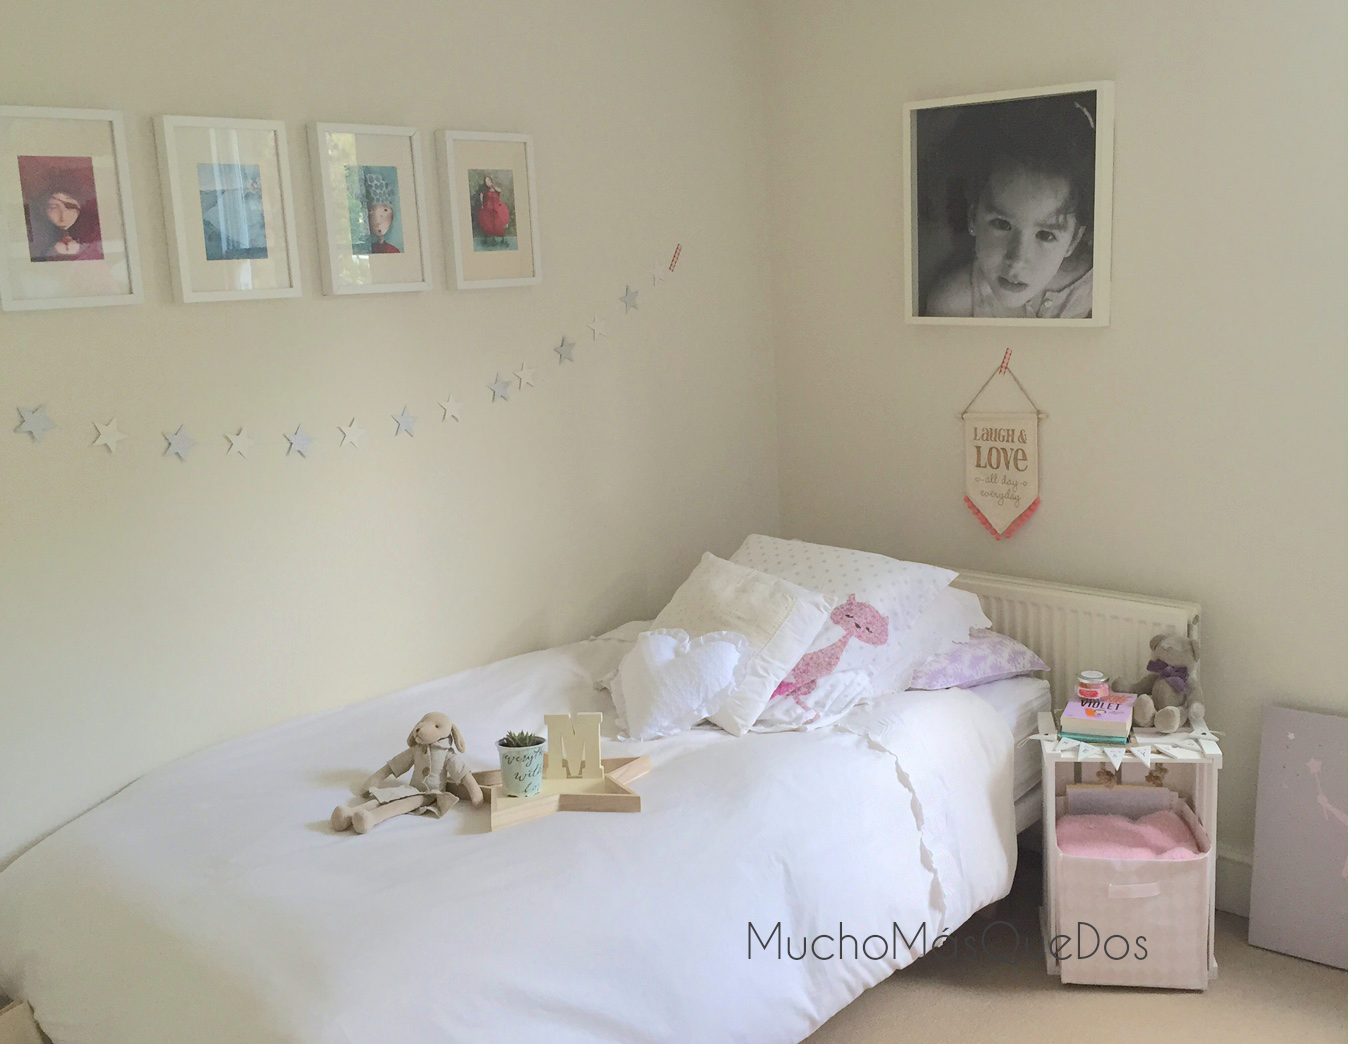 Mucho m s que dos decoraci n infantil low cost la - Habitaciones low cost ...